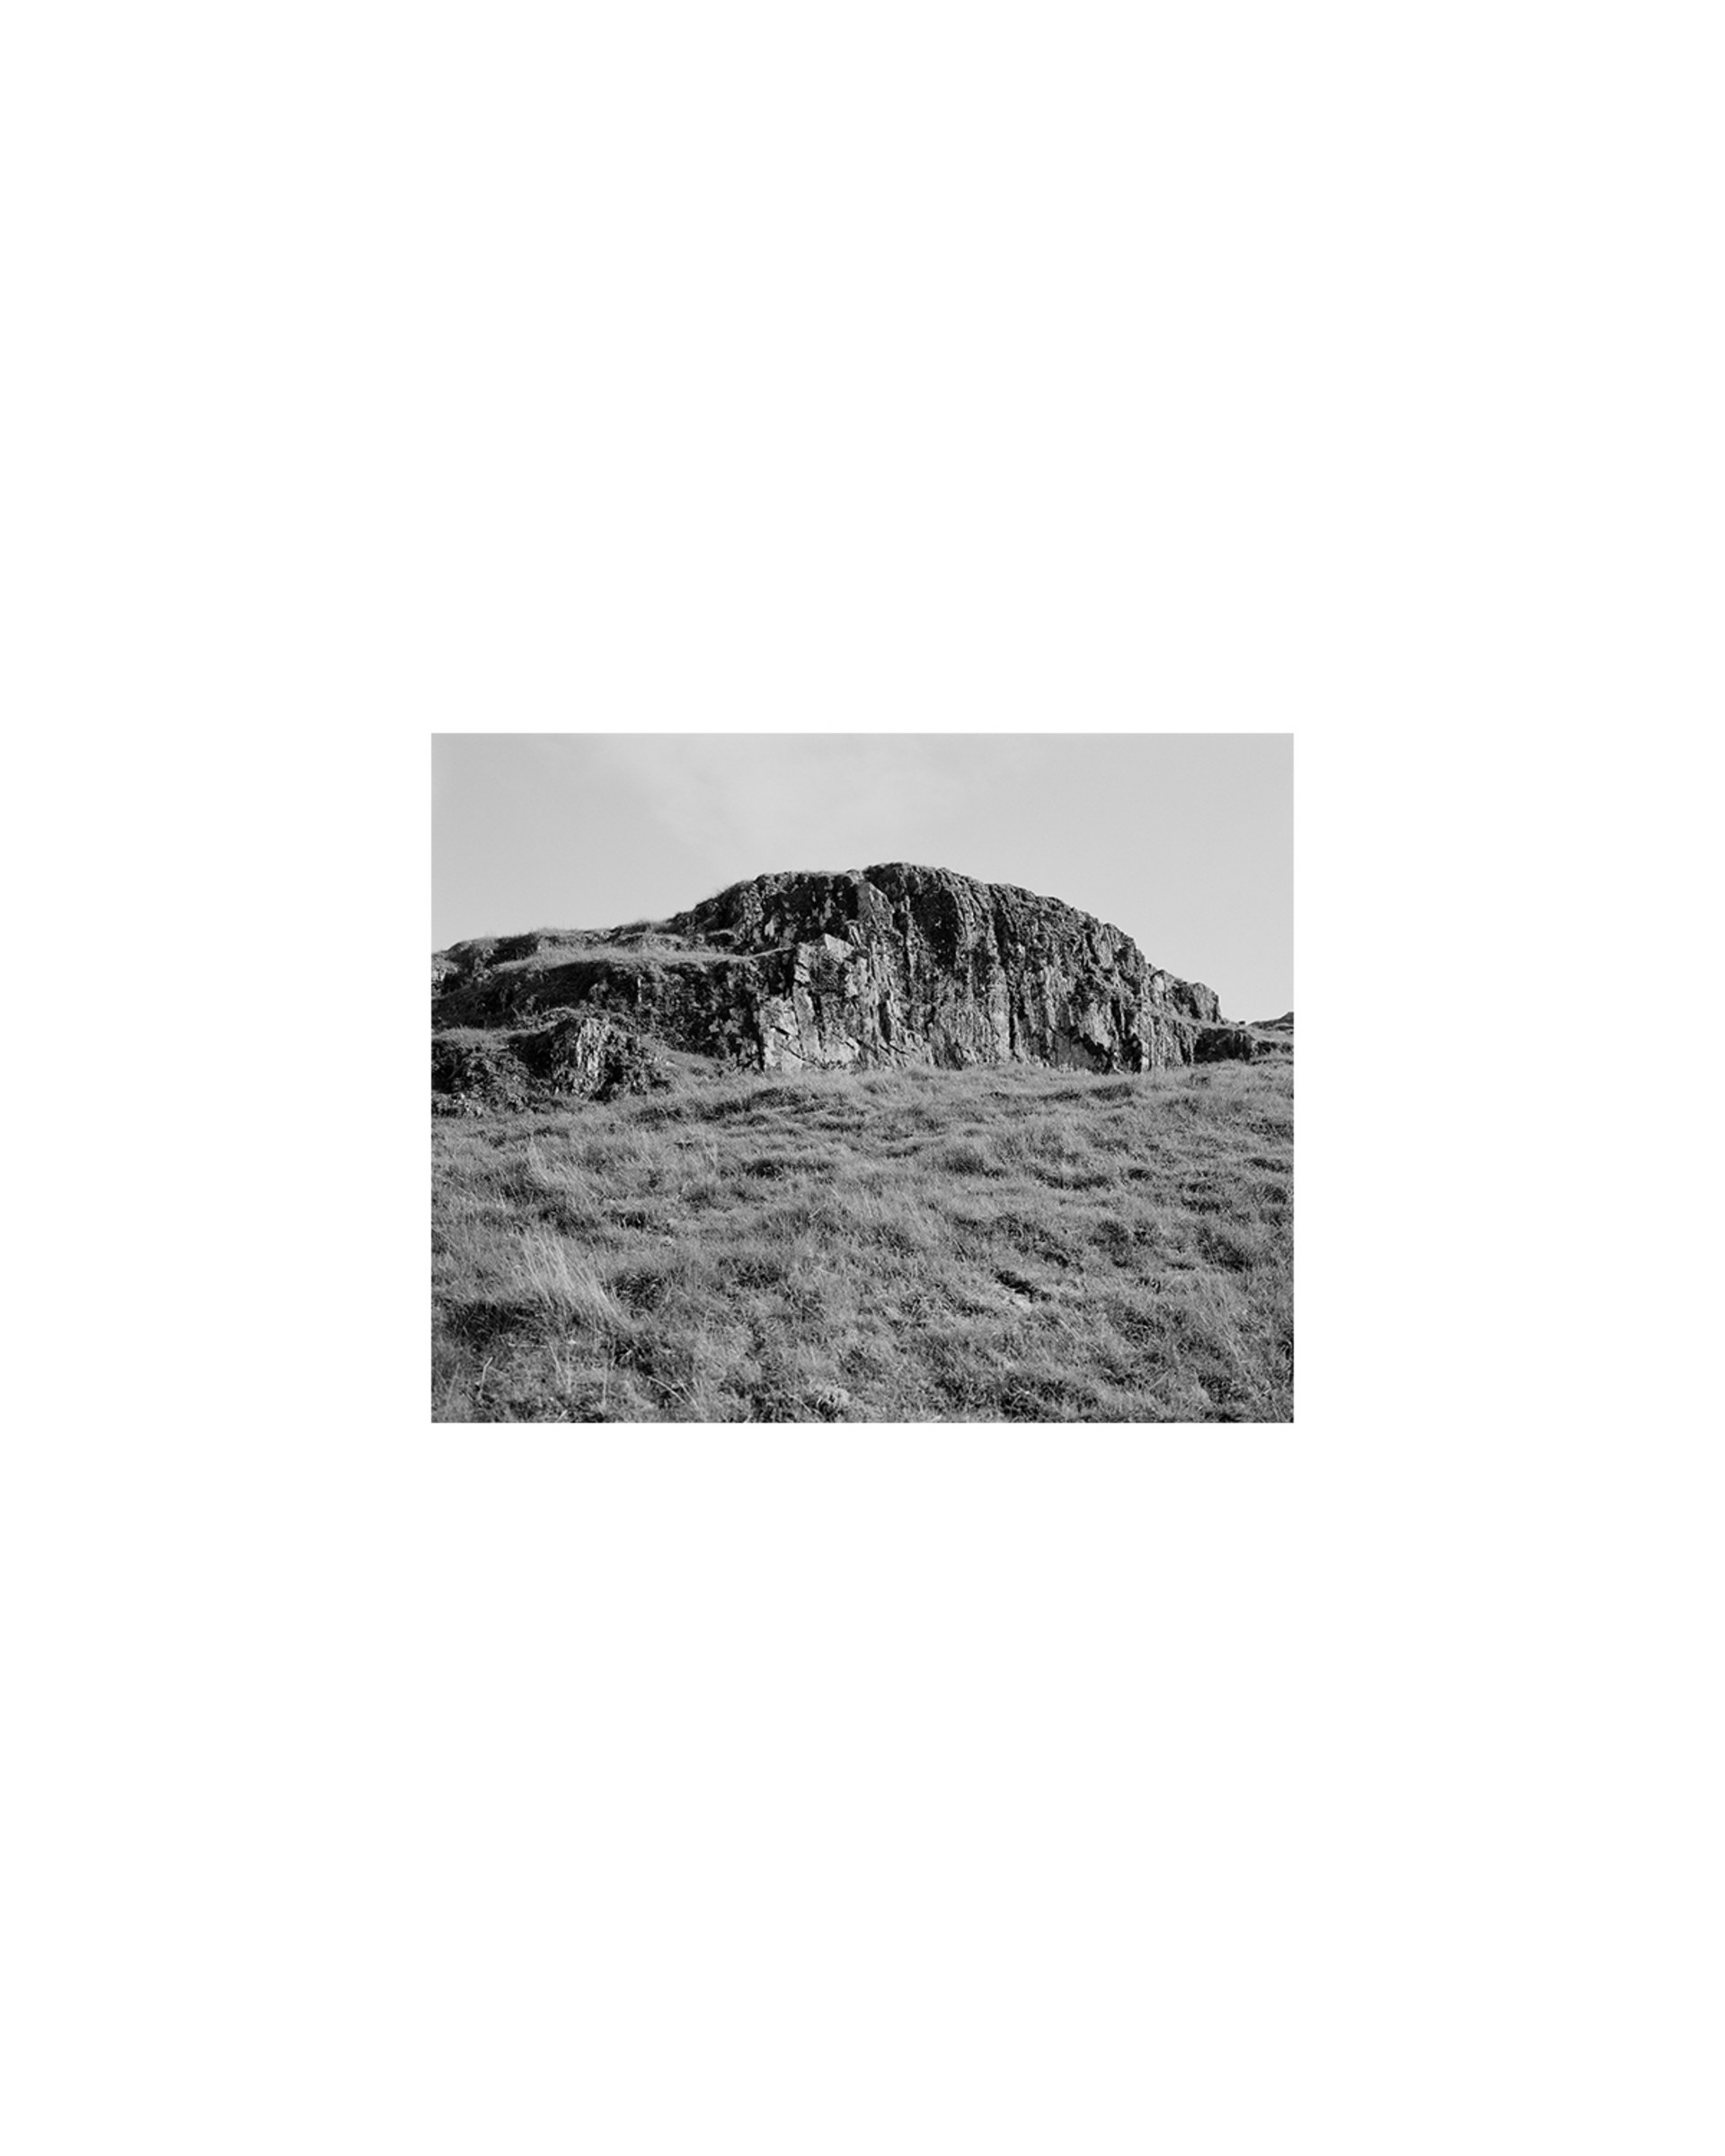 Centuries (mountains) ↑